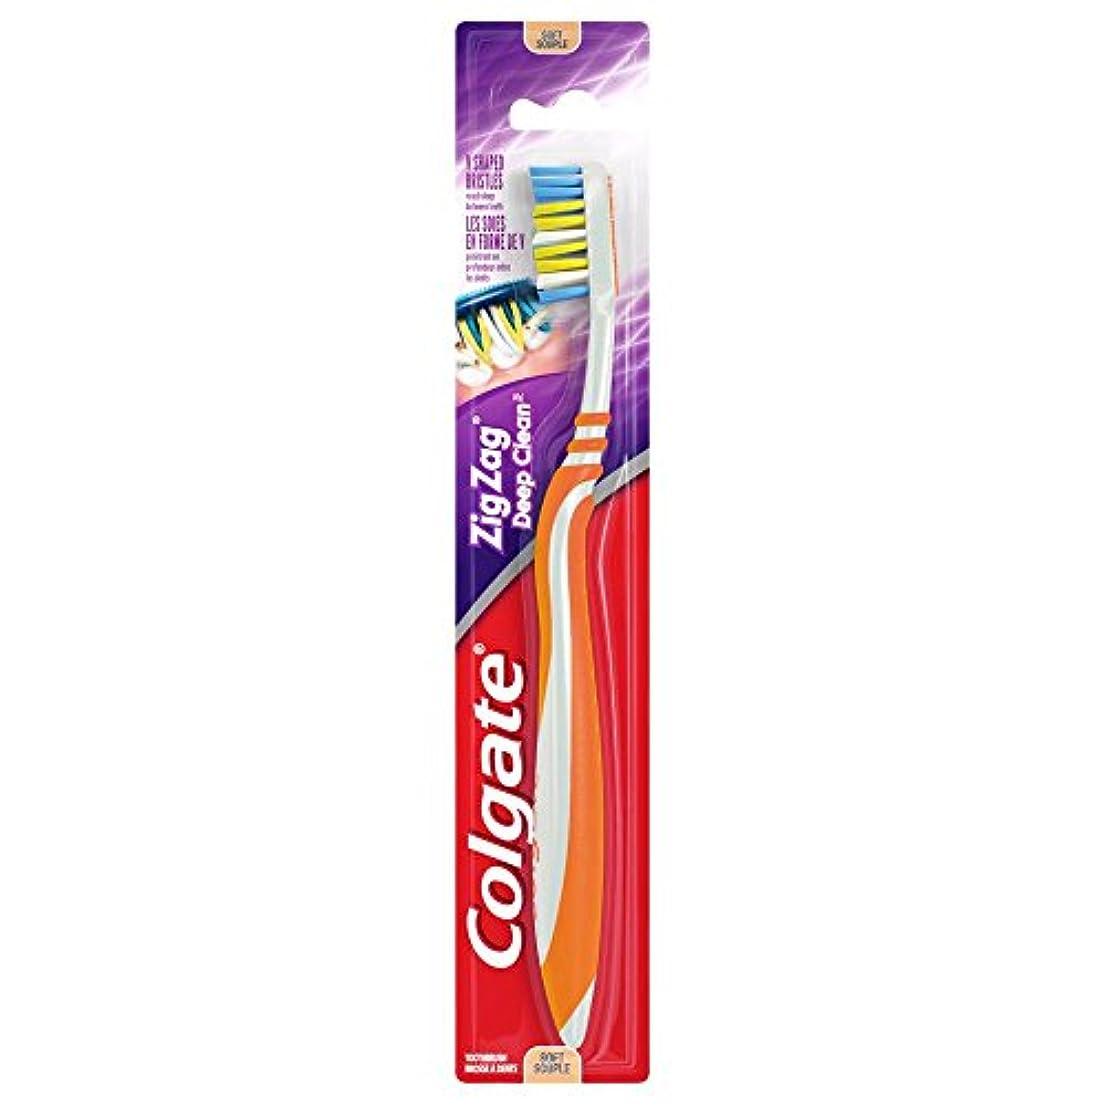 Colgate ジグザグディープクリーン歯ブラシ、ソフト - 6パック